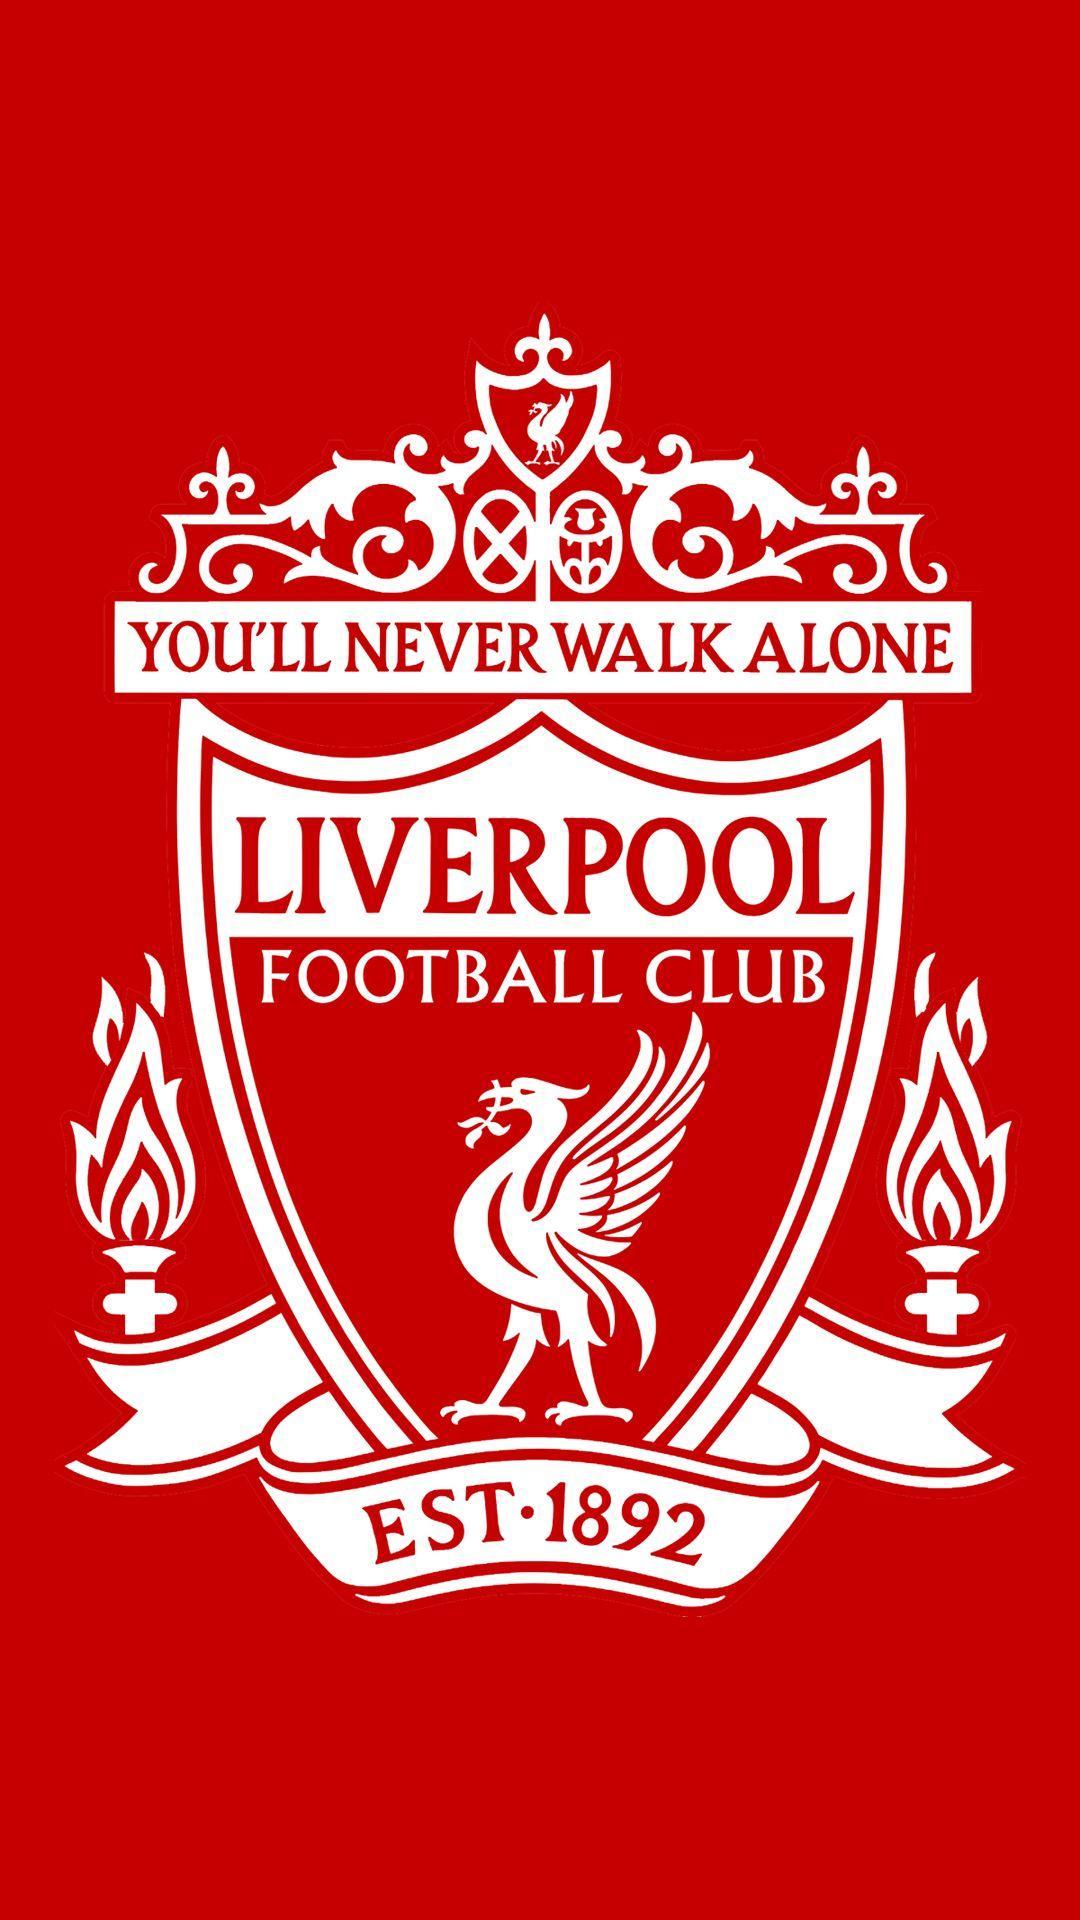 iPhone X Wallpaper Liverpool | 2020 3D iPhone Wallpaper |Liverpool Screensavers